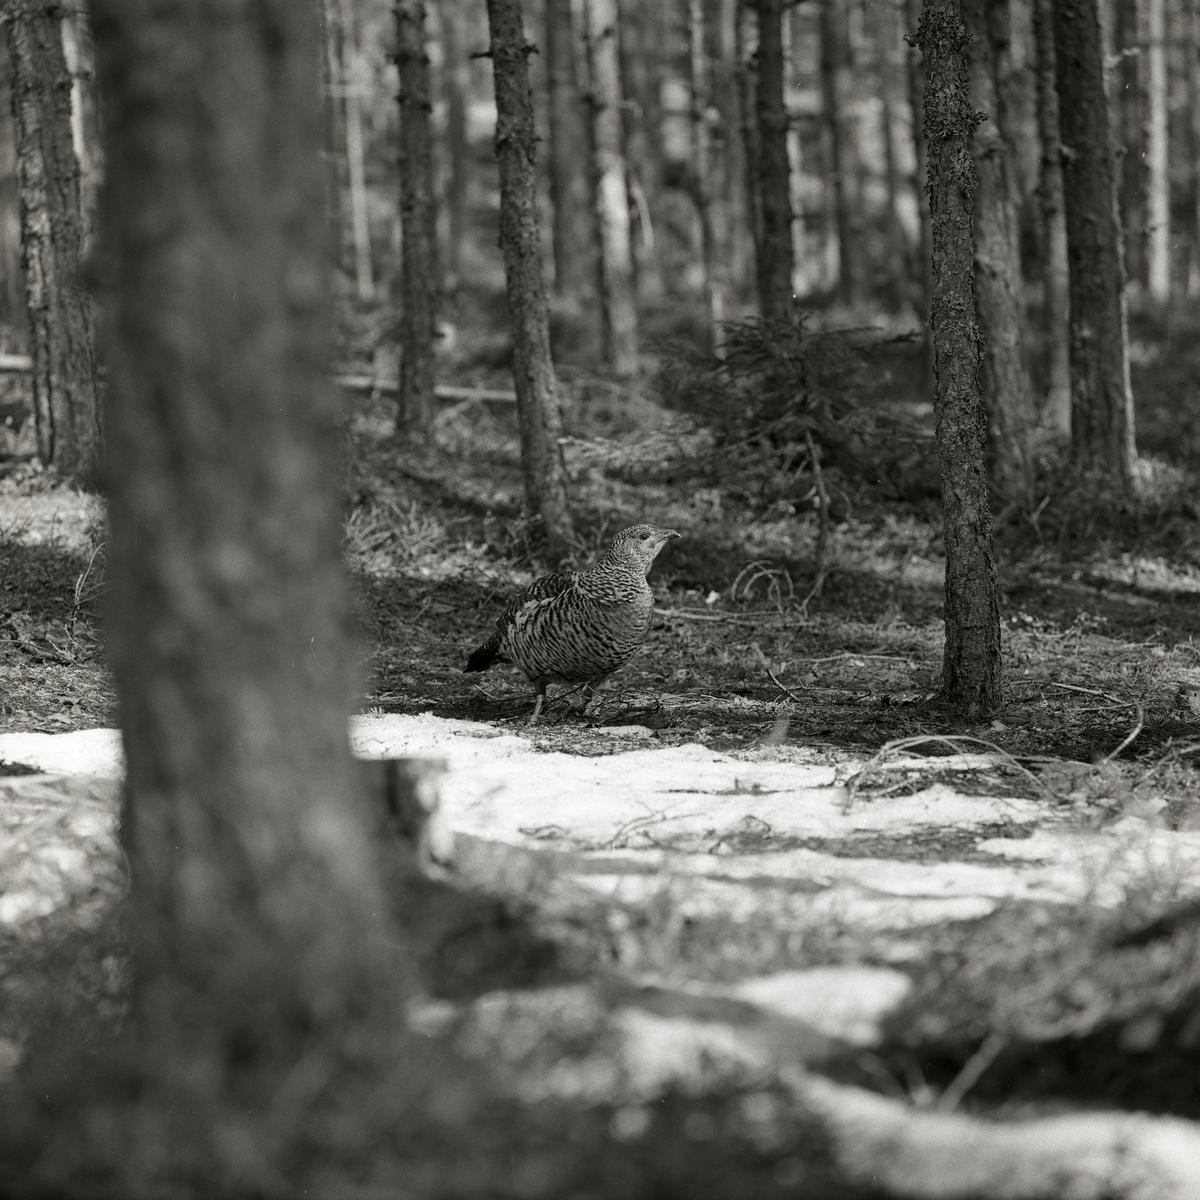 En tjäderhöna i gles tallskog i Nordanhöle den 25 april 1960.